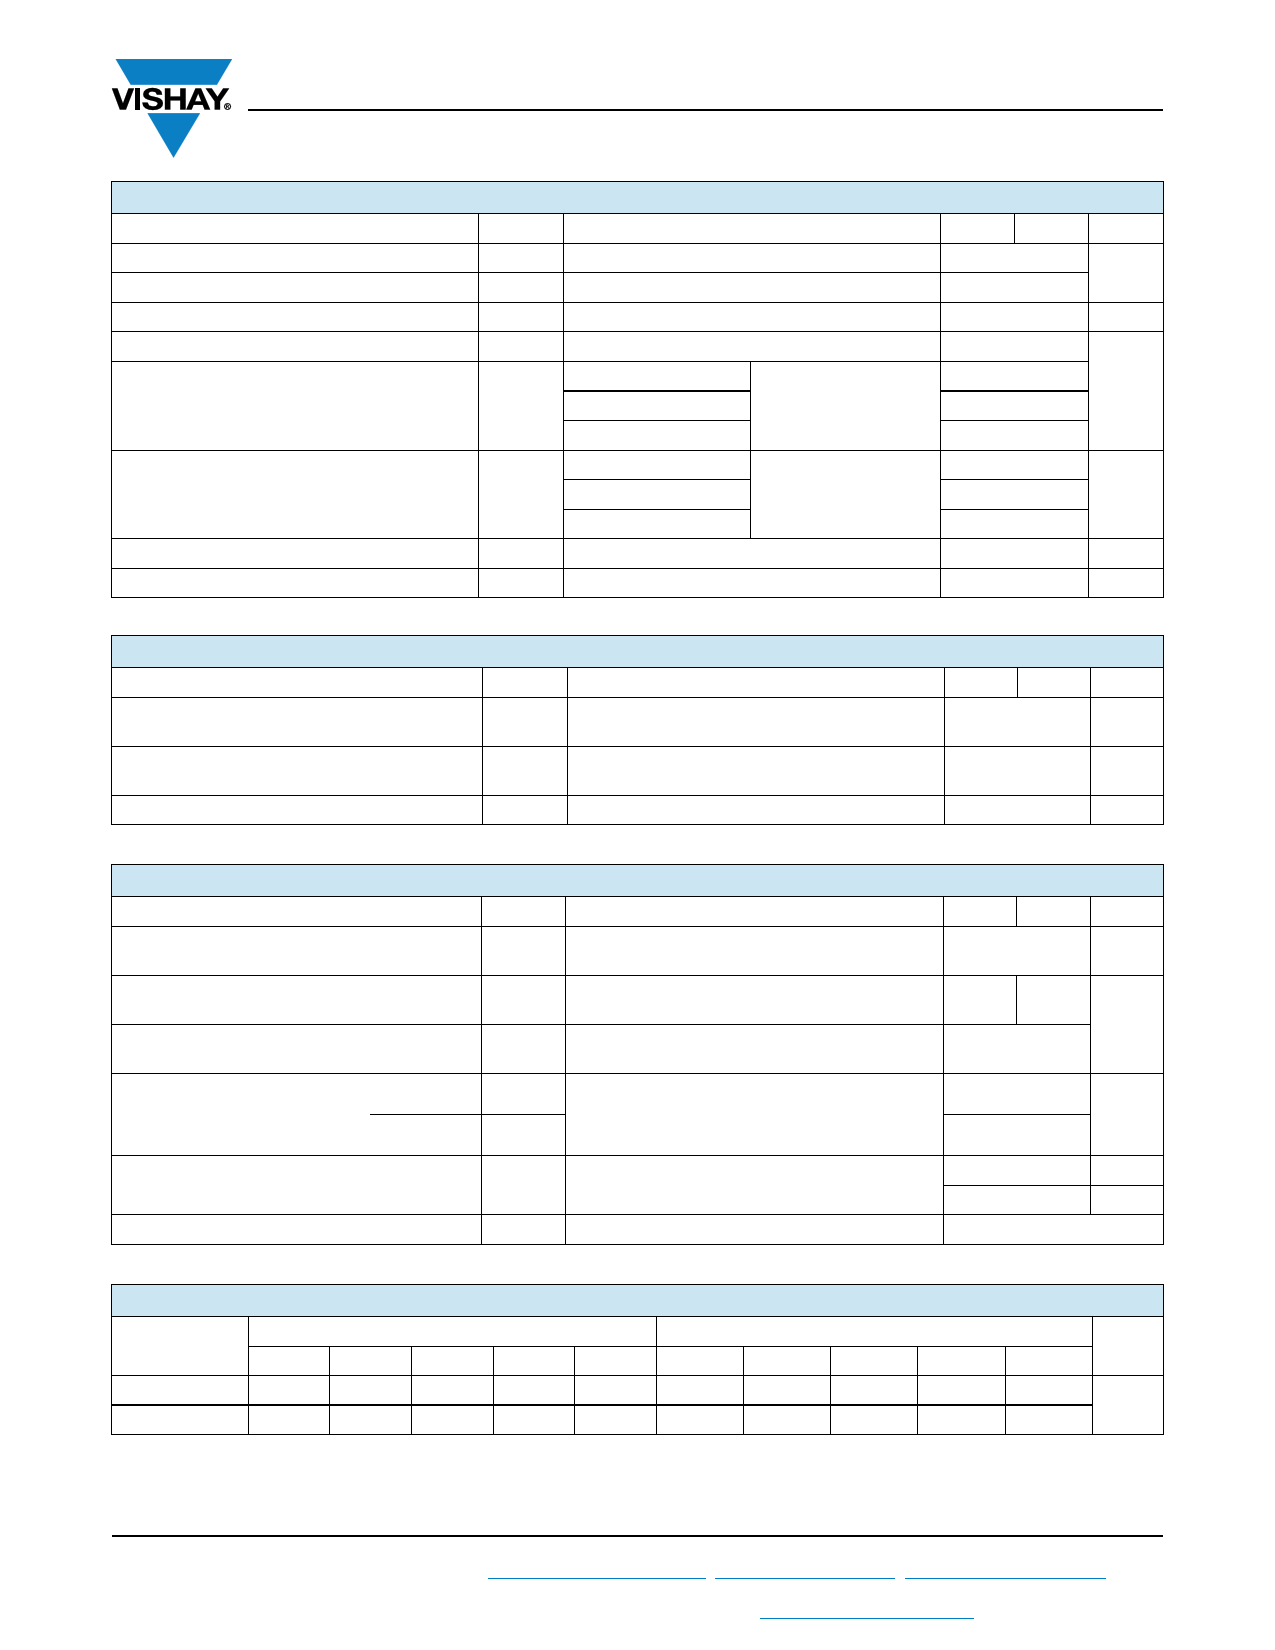 VSKT41-10S90P pdf, ピン配列